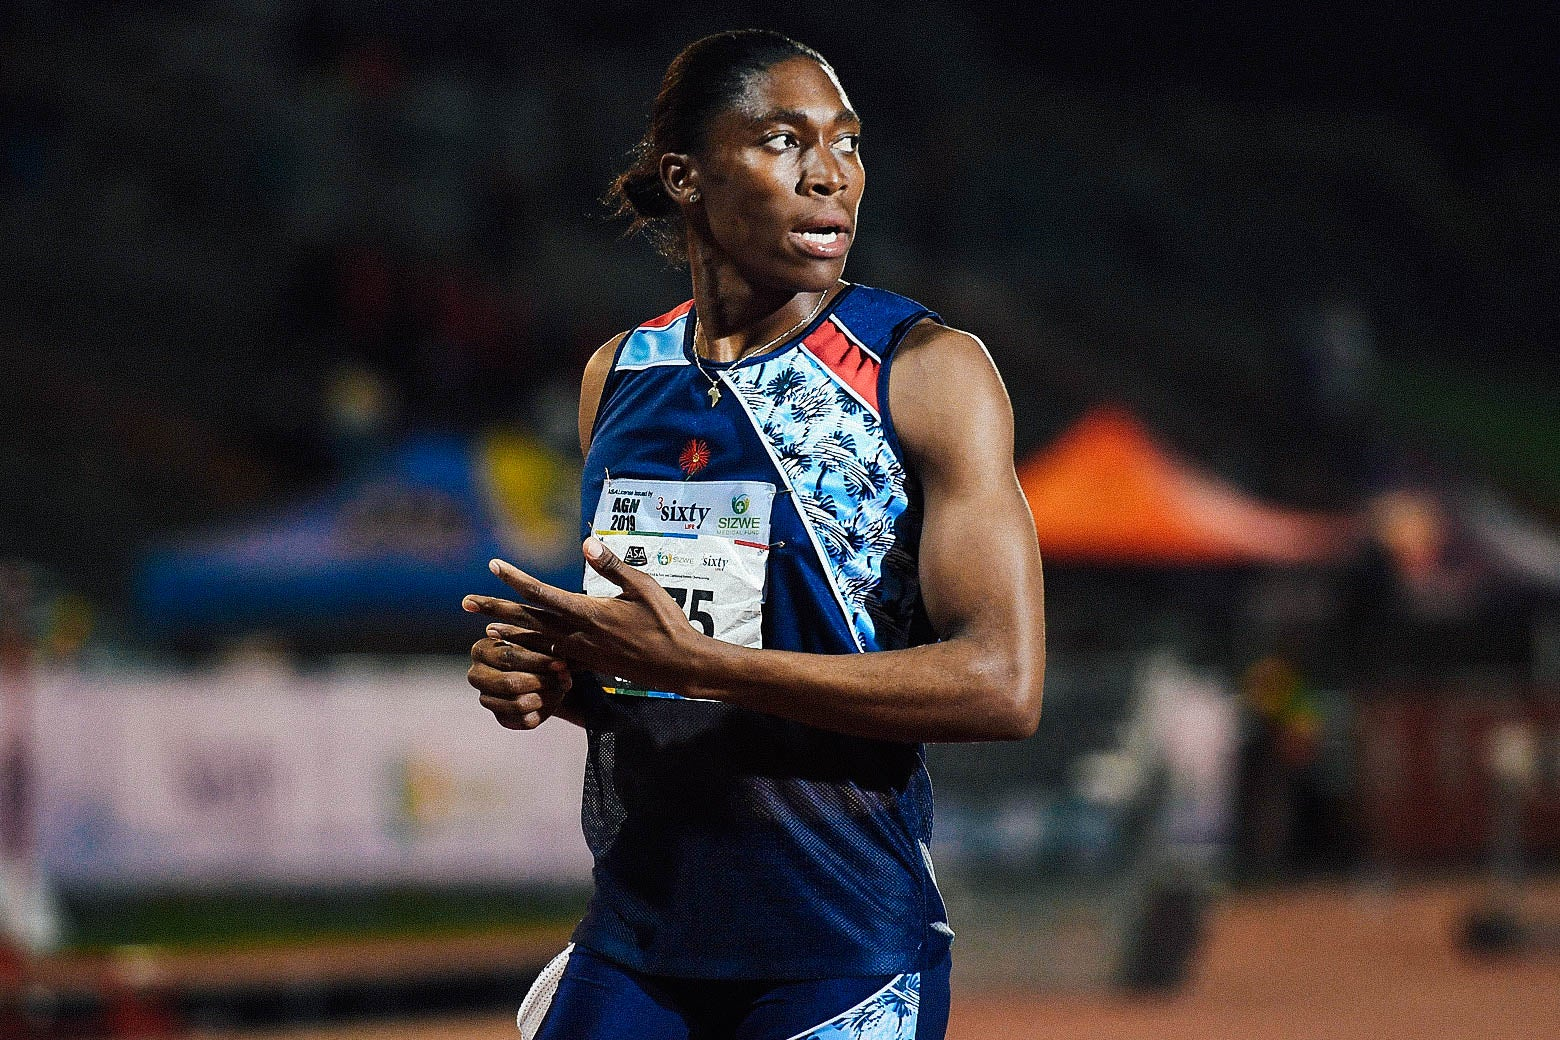 Semenya walking on the track.